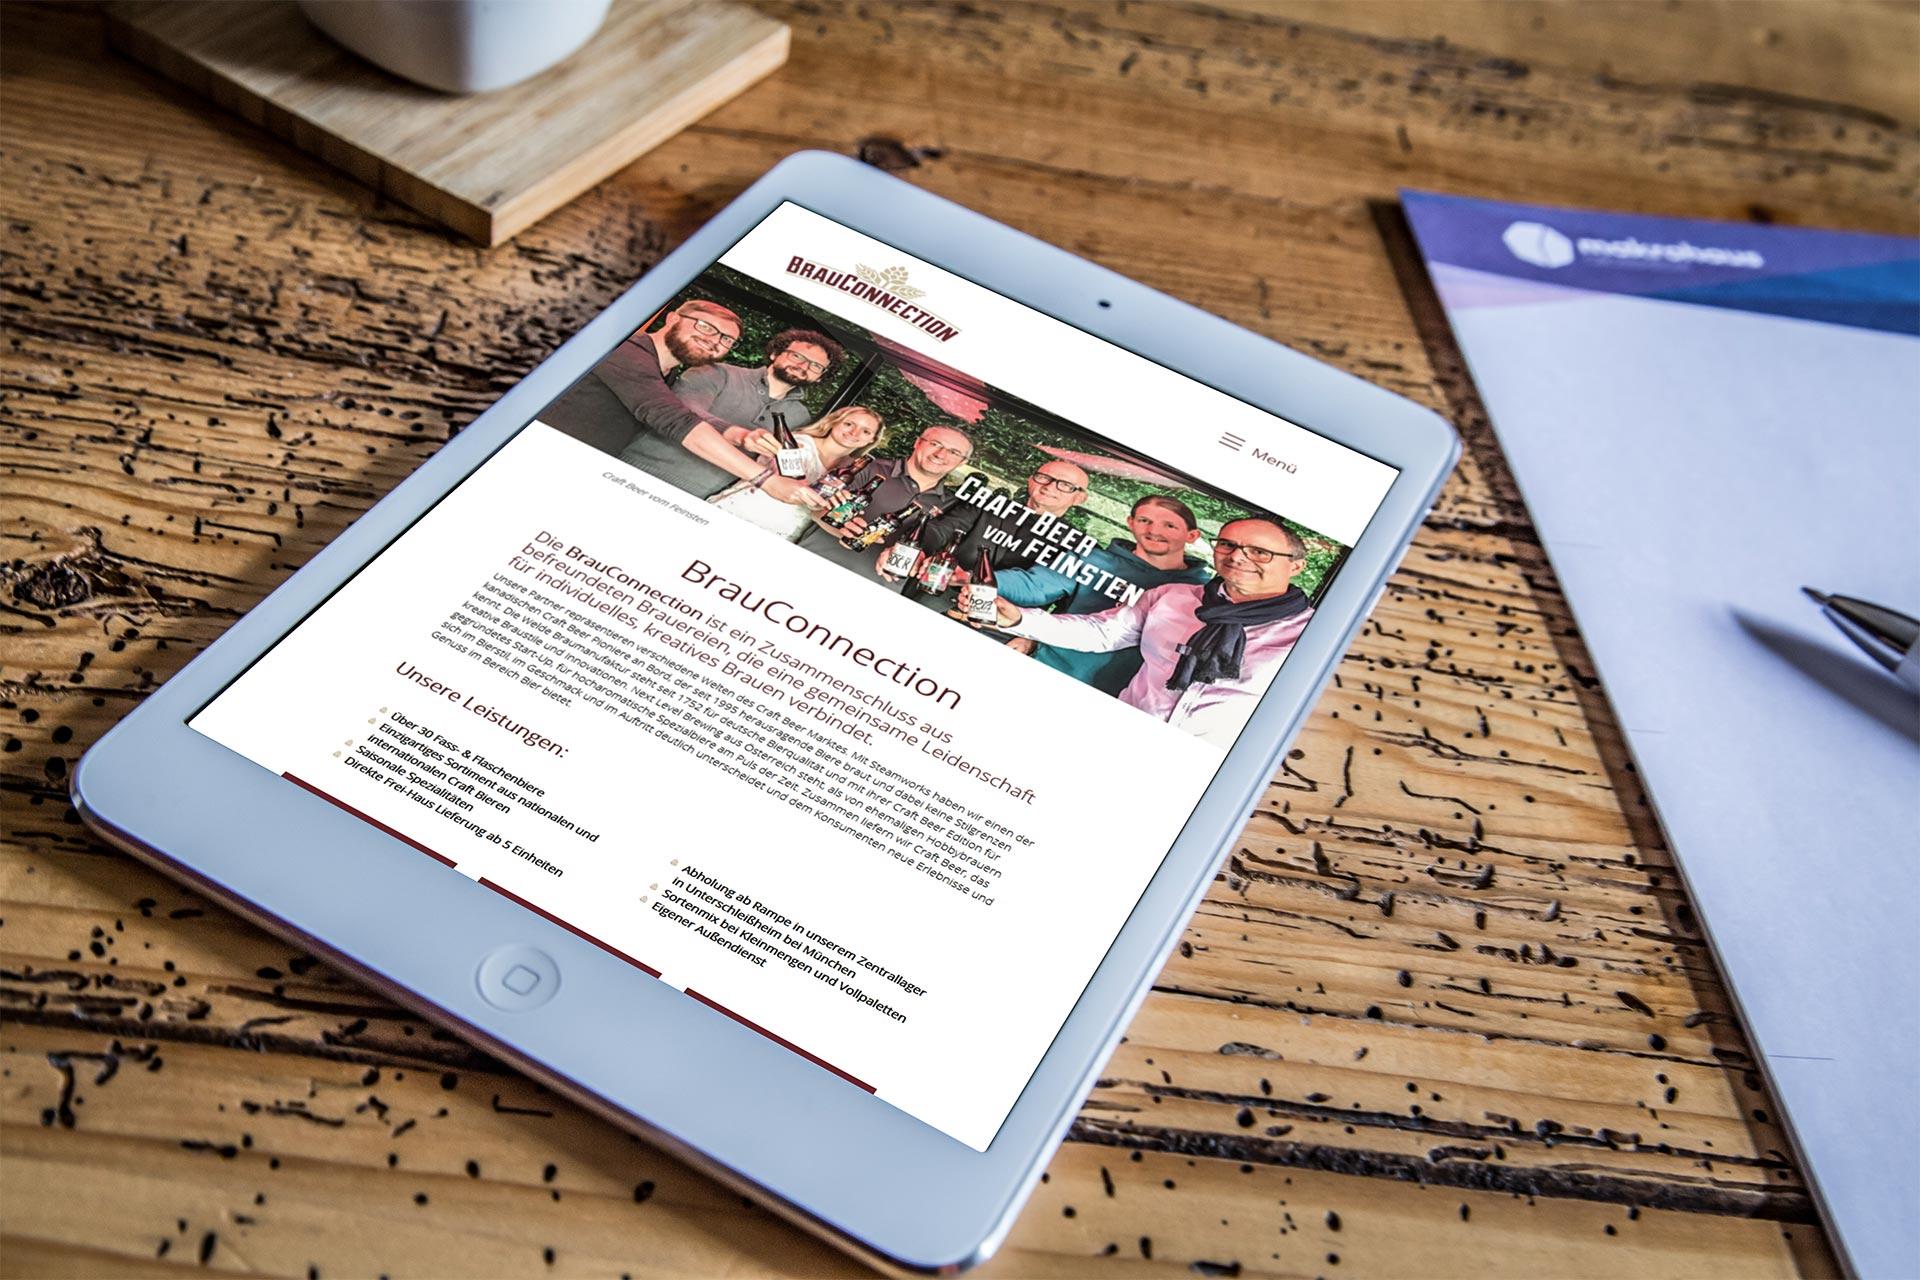 Bi Brau Connection Tablet